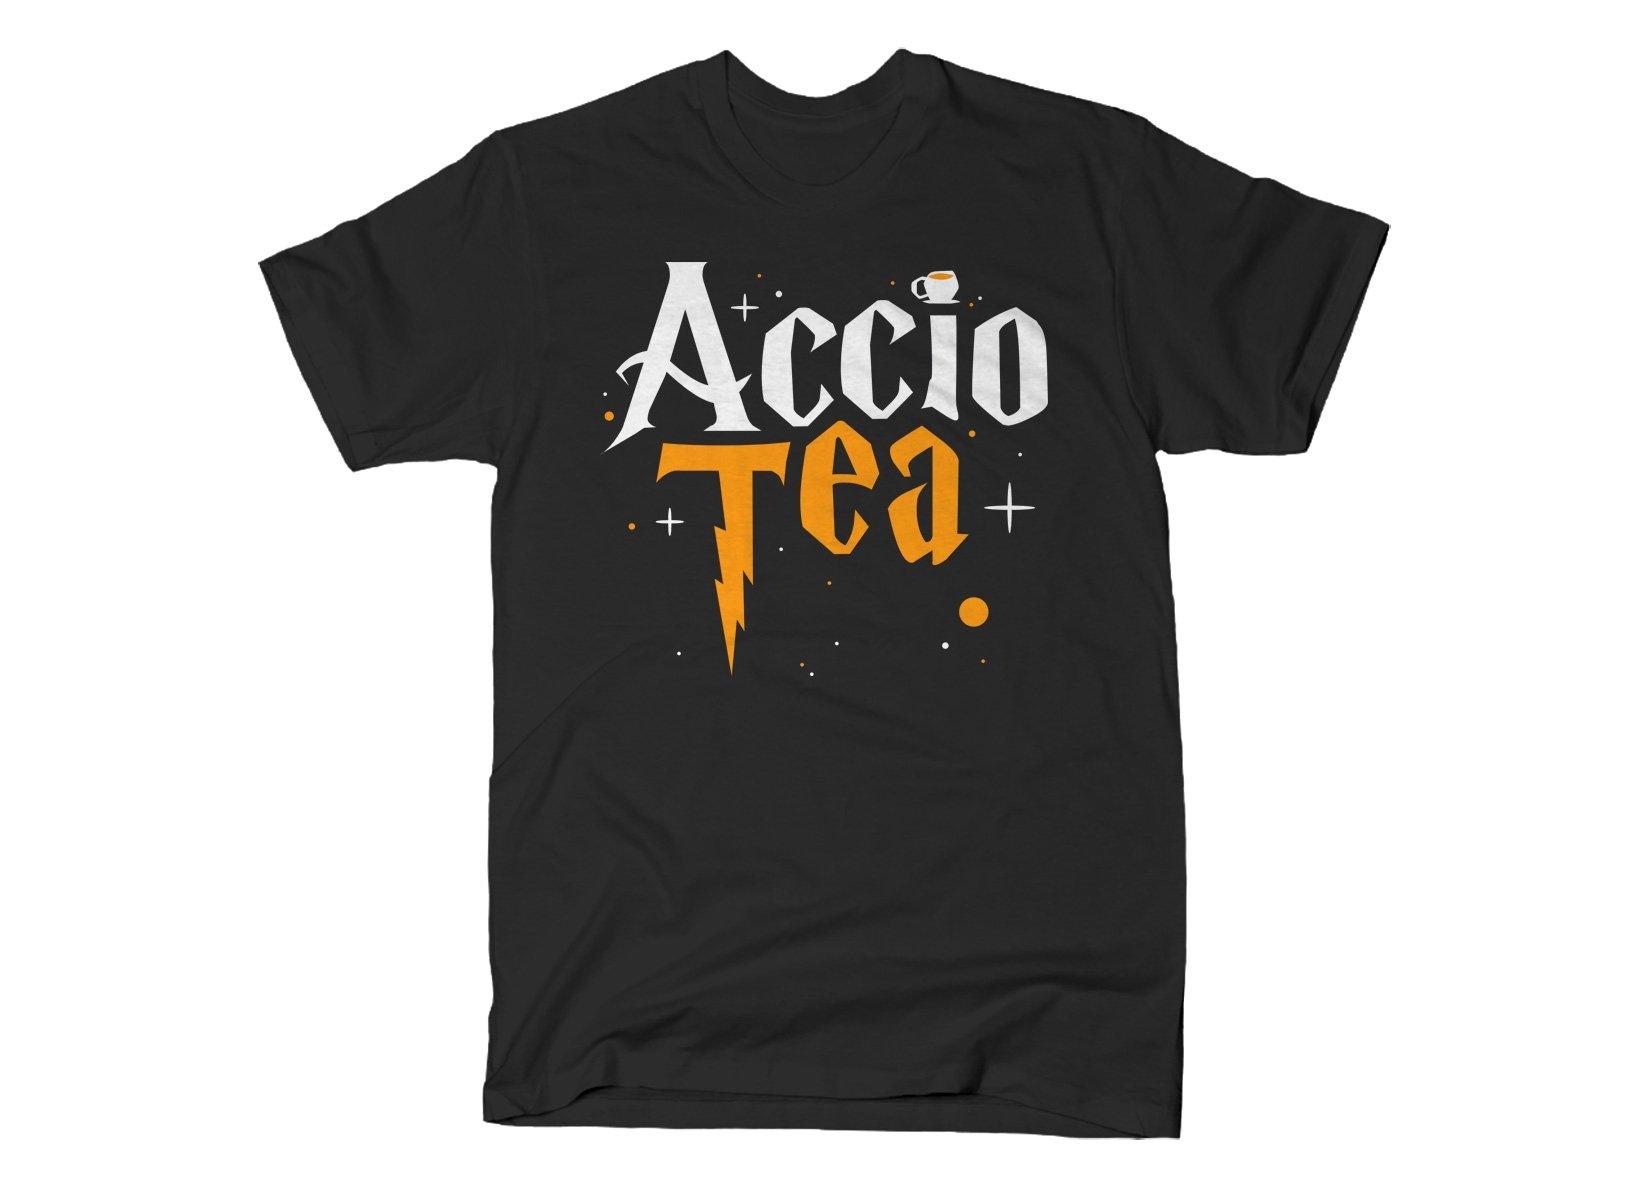 Accio Tea on Mens T-Shirt